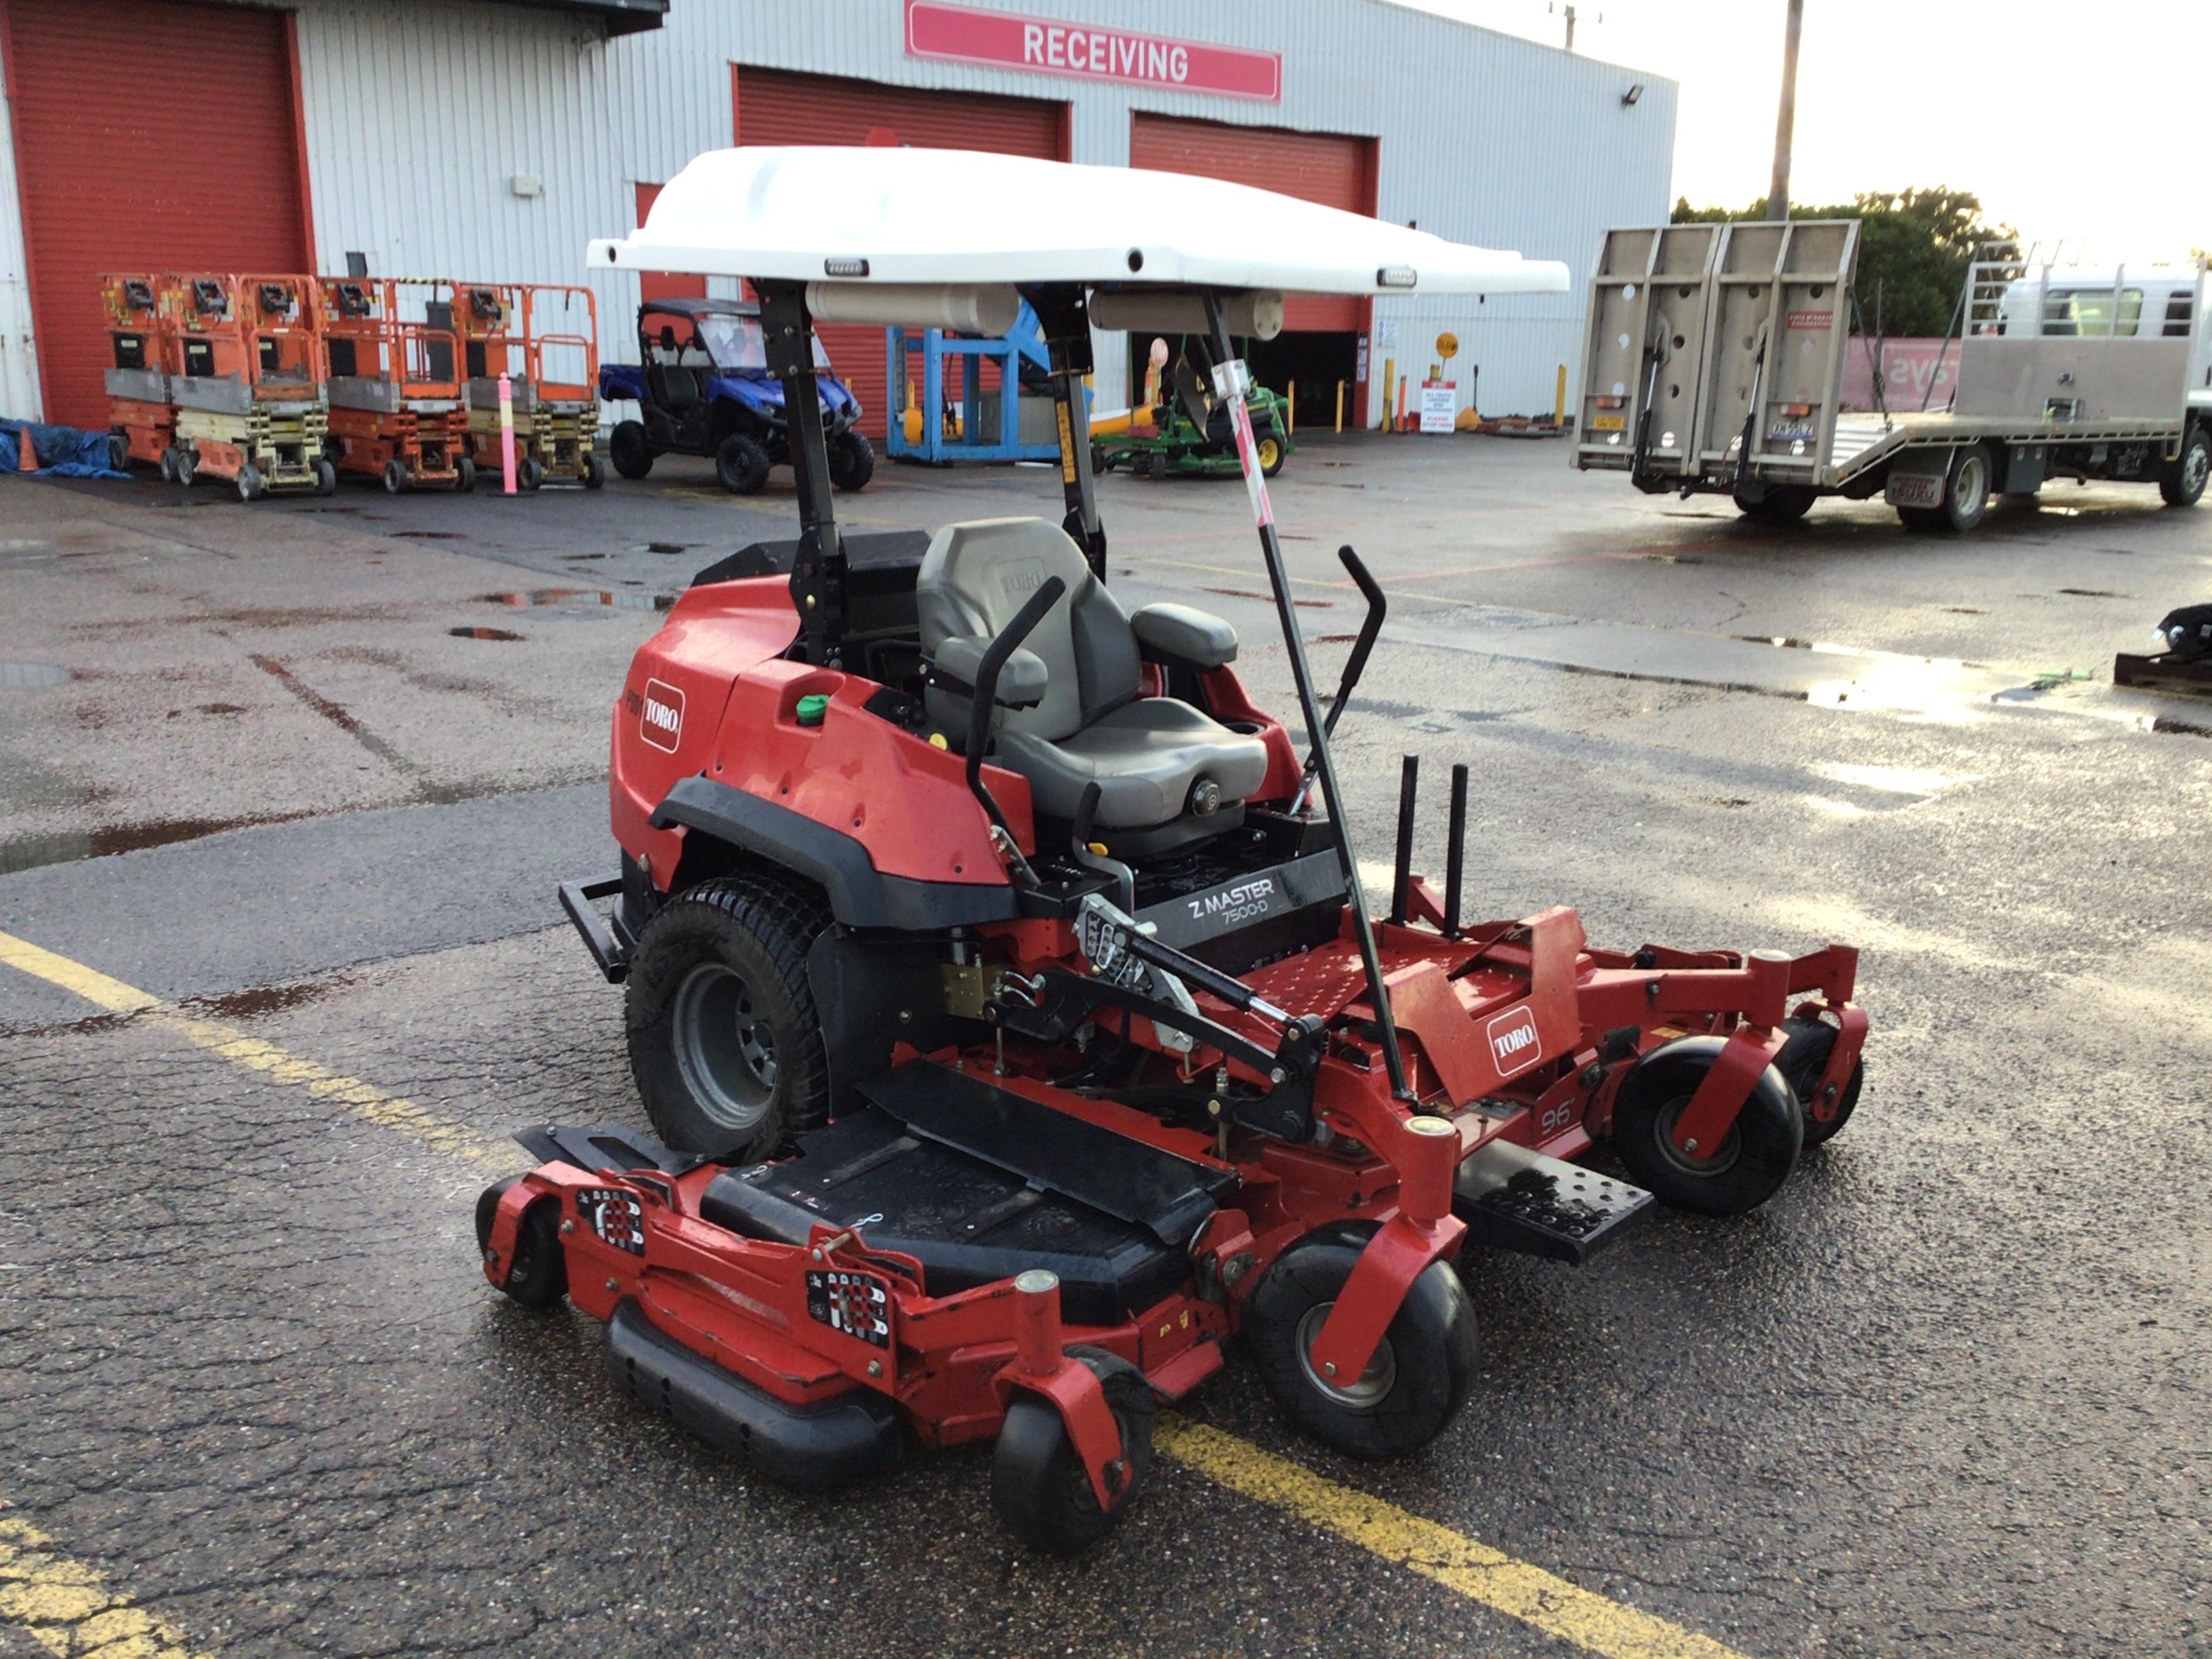 2019 Toro Z Master 7500-D Ride On Lawn Mower